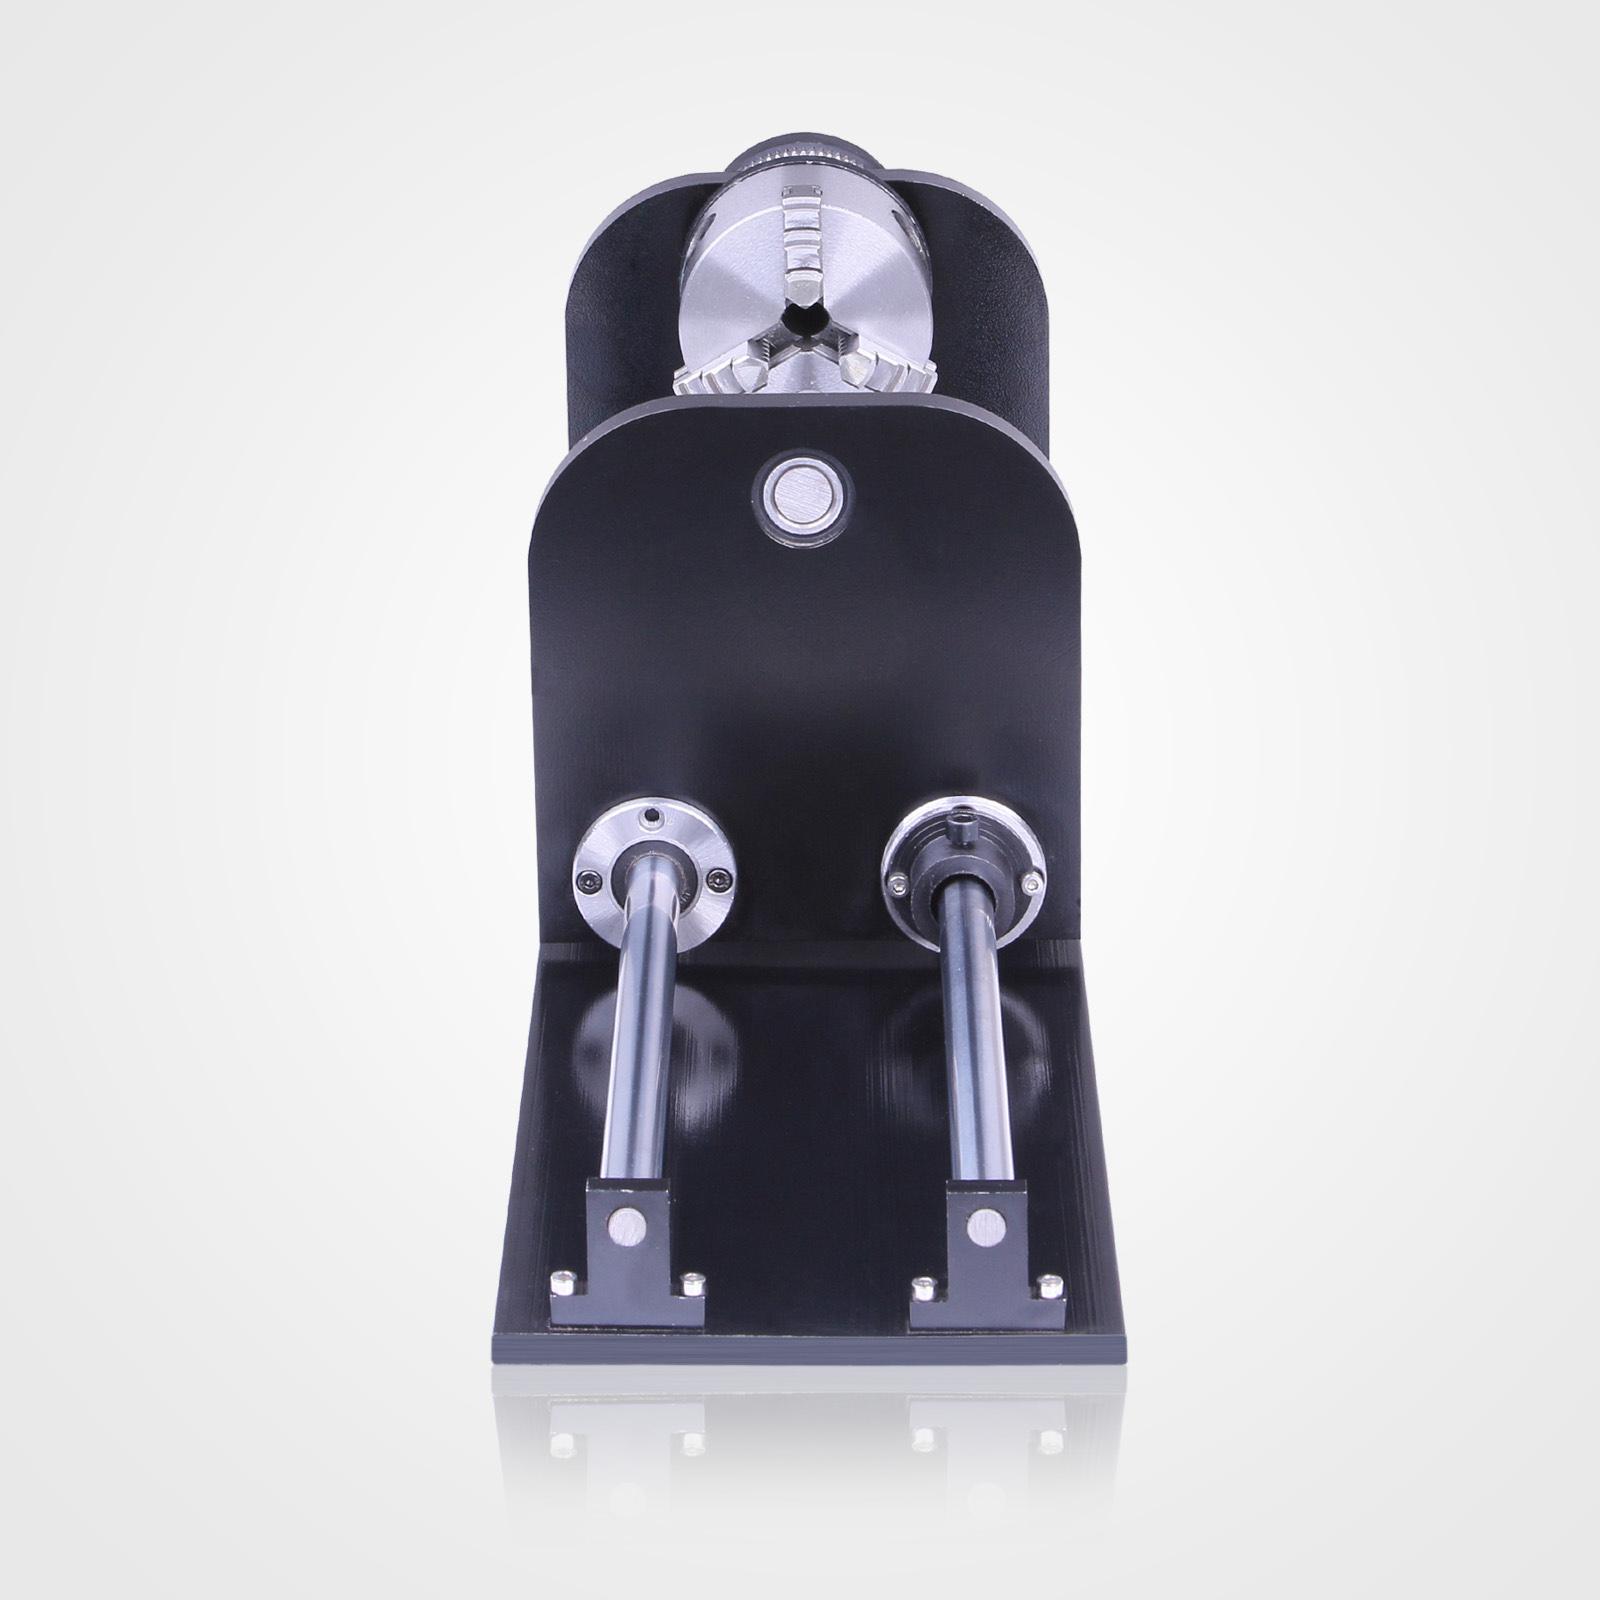 Macchina-per-Incisione-Laser-CO2-40-130W-Asse-Rotante-Tagliatrice-Incisore miniatura 89